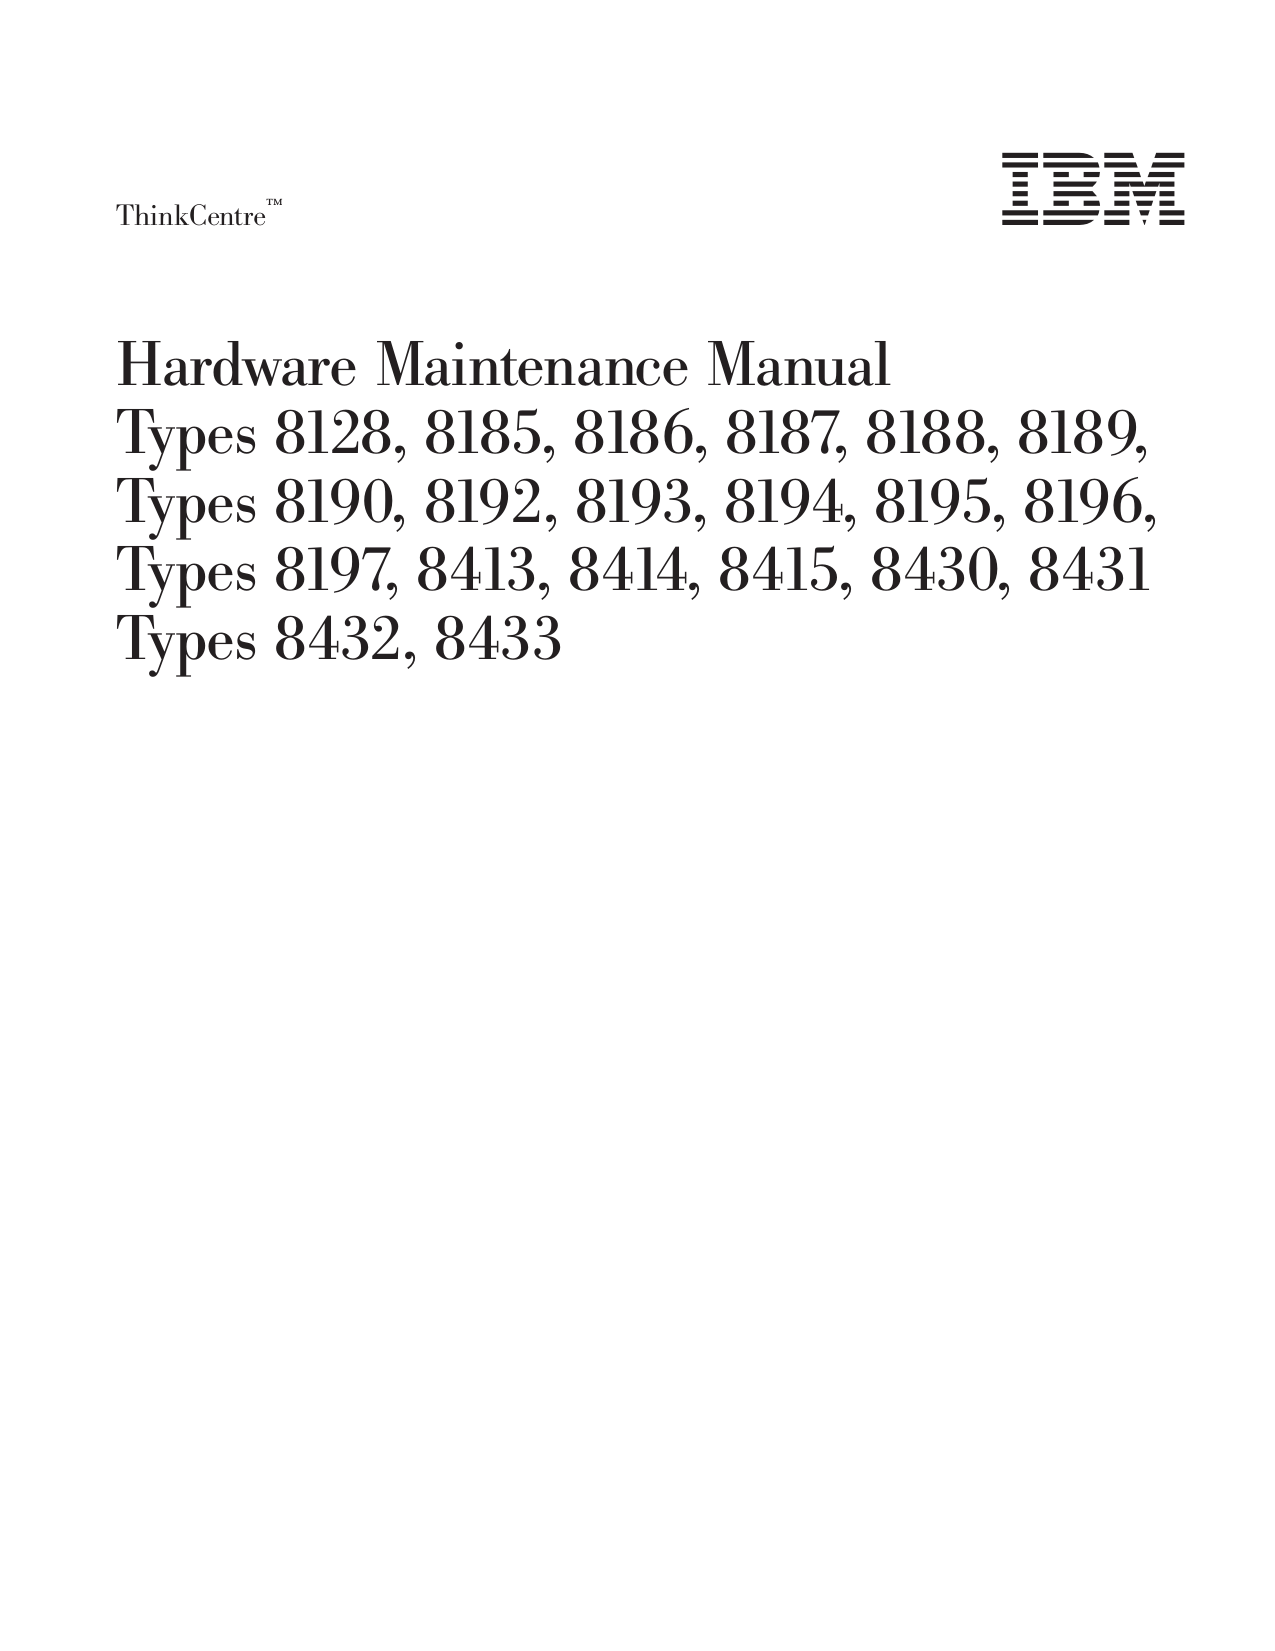 pdf for Lenovo Desktop ThinkCentre M50 8431 manual